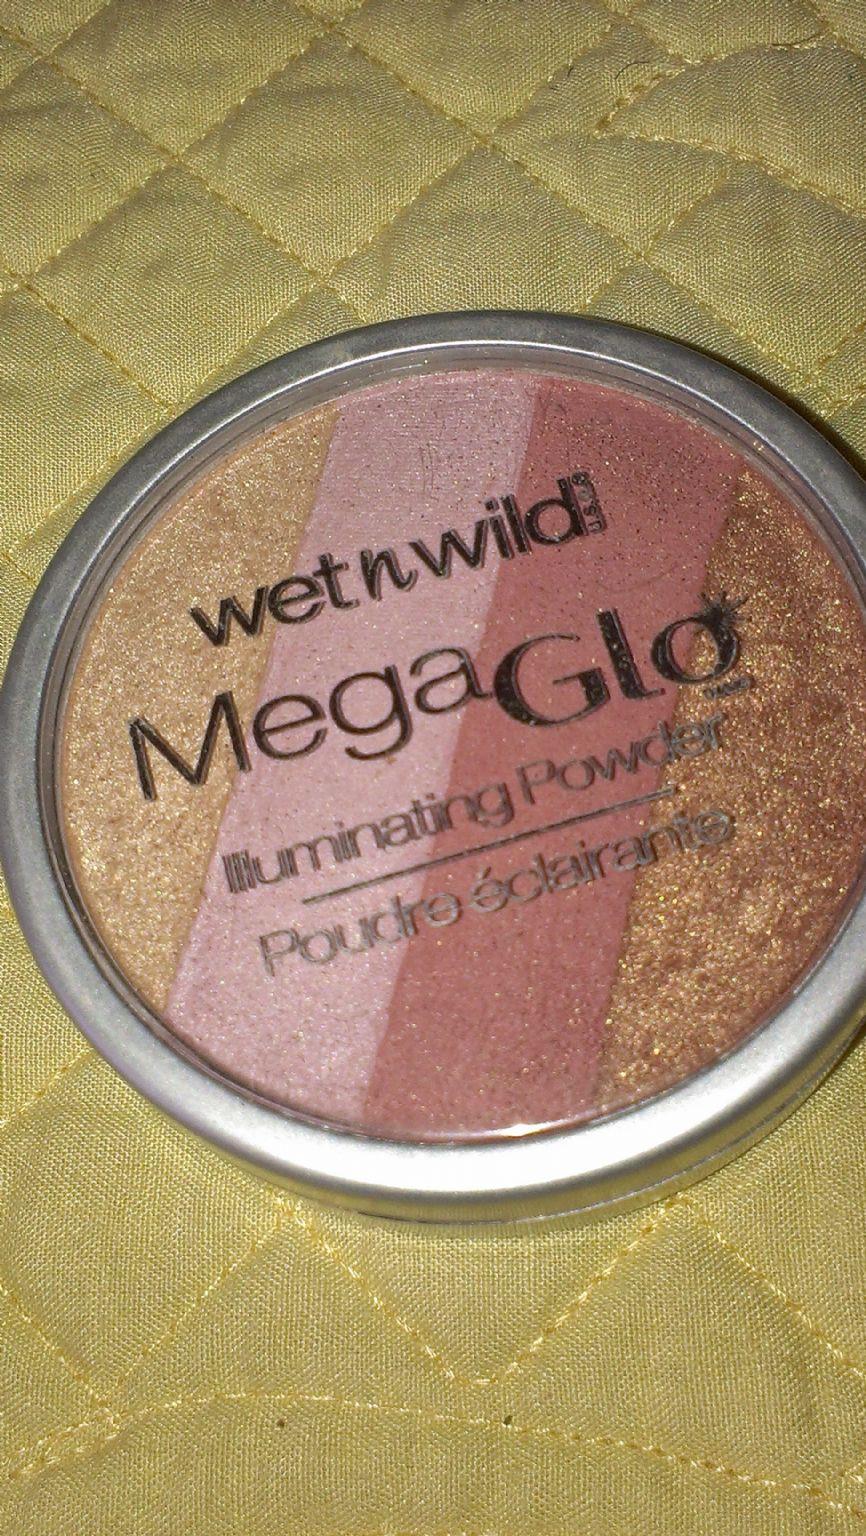 Wet 'n' Wild Mega Glo Illuminating Powder